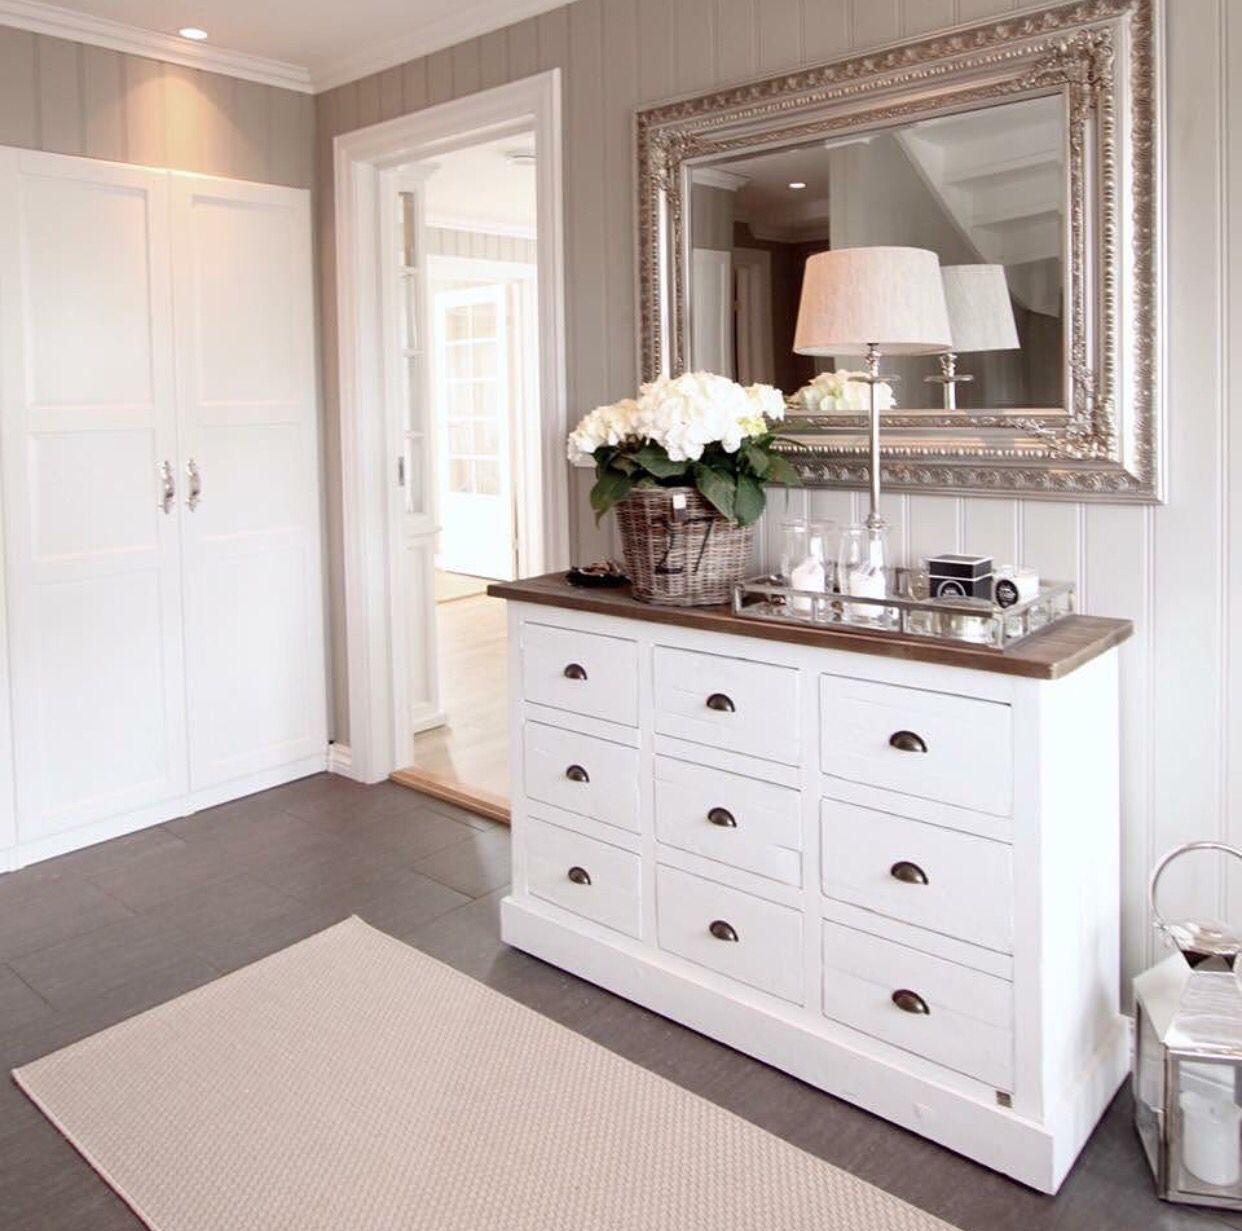 Hallway Interior, Dining room decor diy, Home decor bedroom